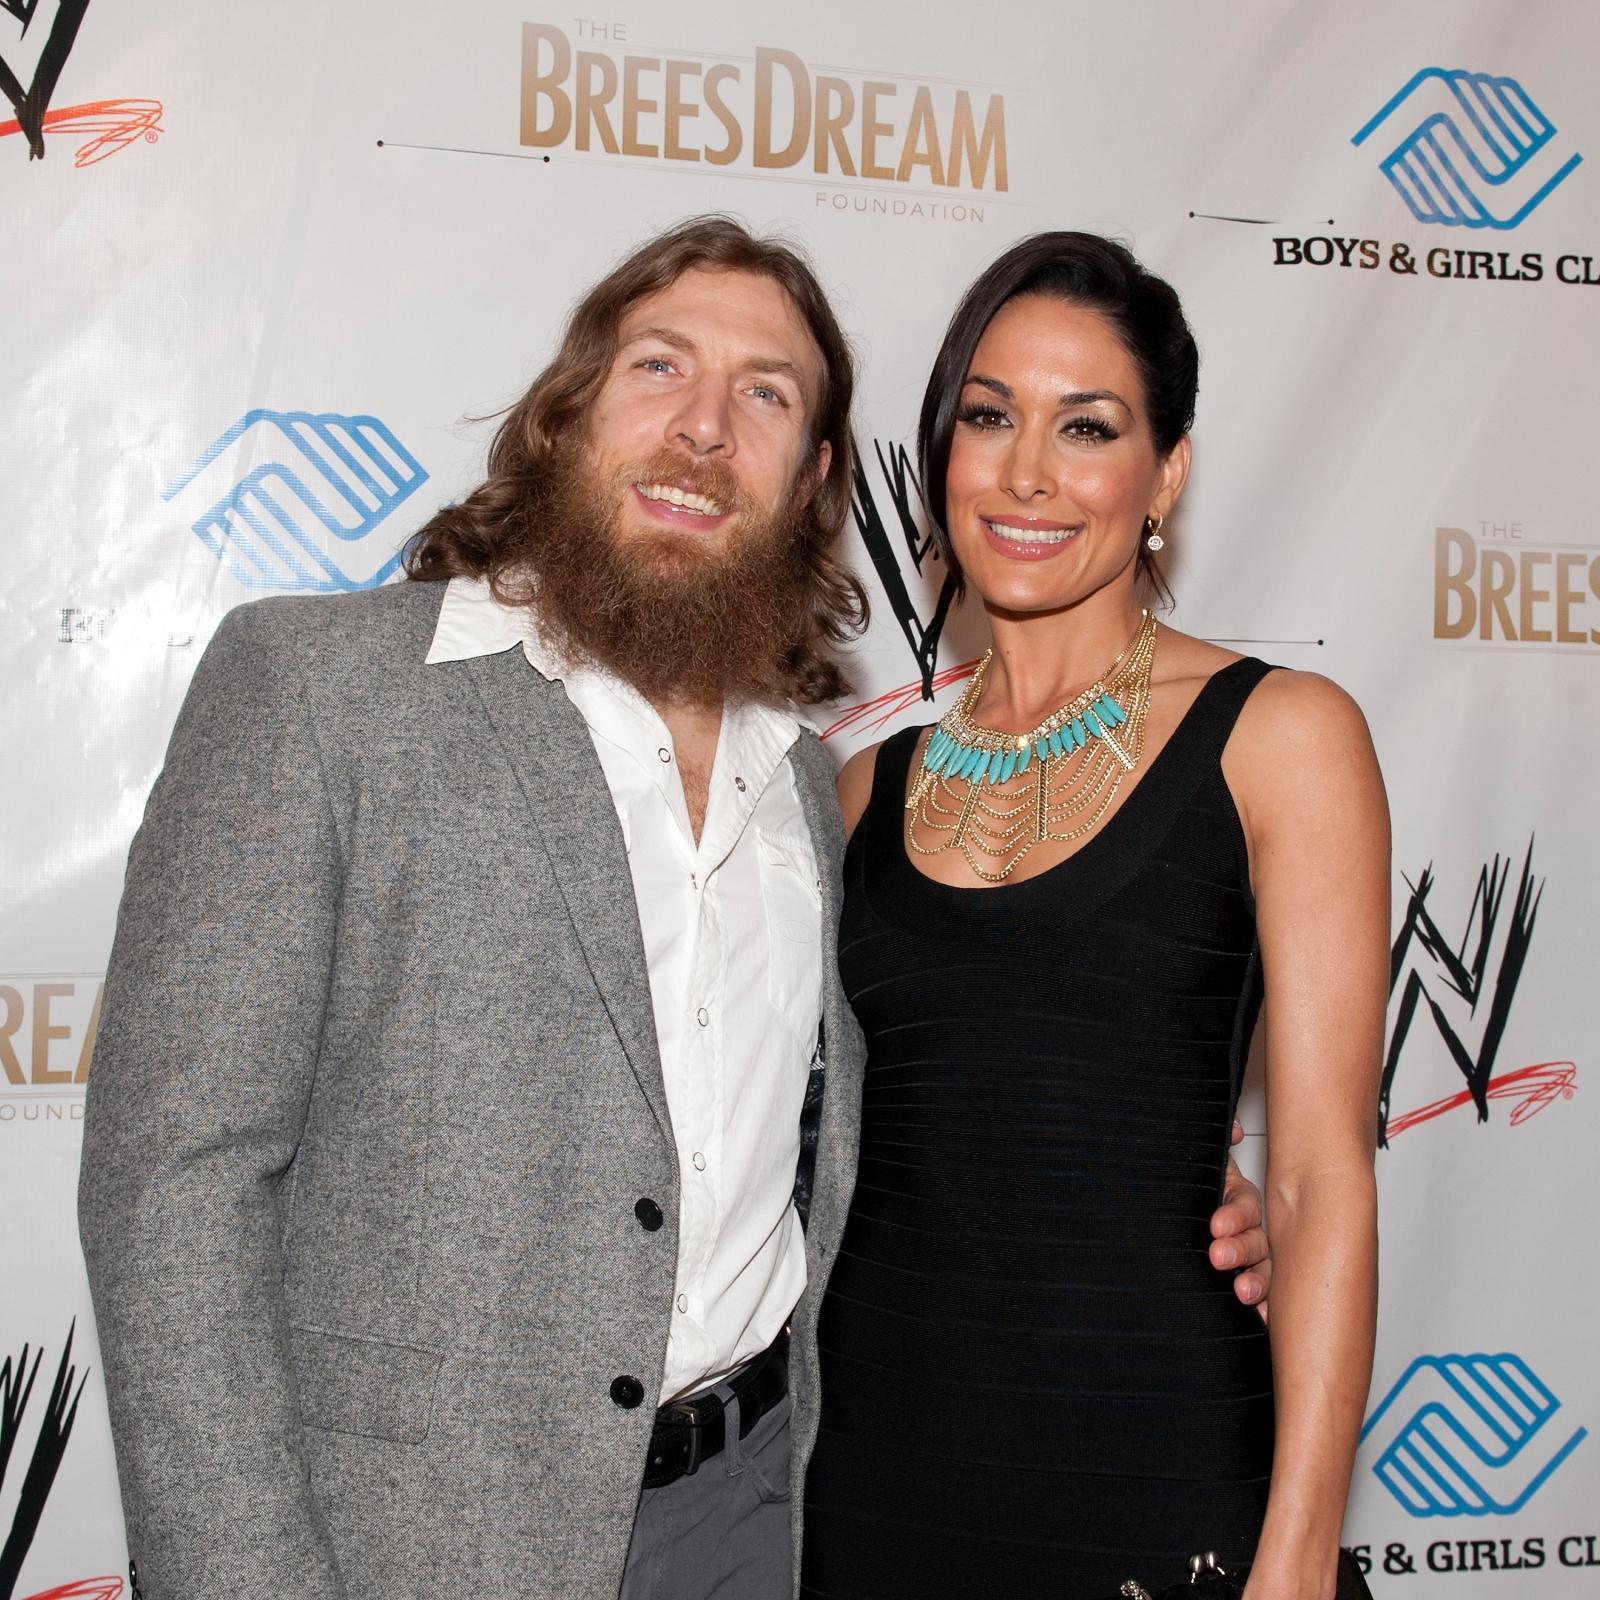 Daniel Bryan and Brie Bella